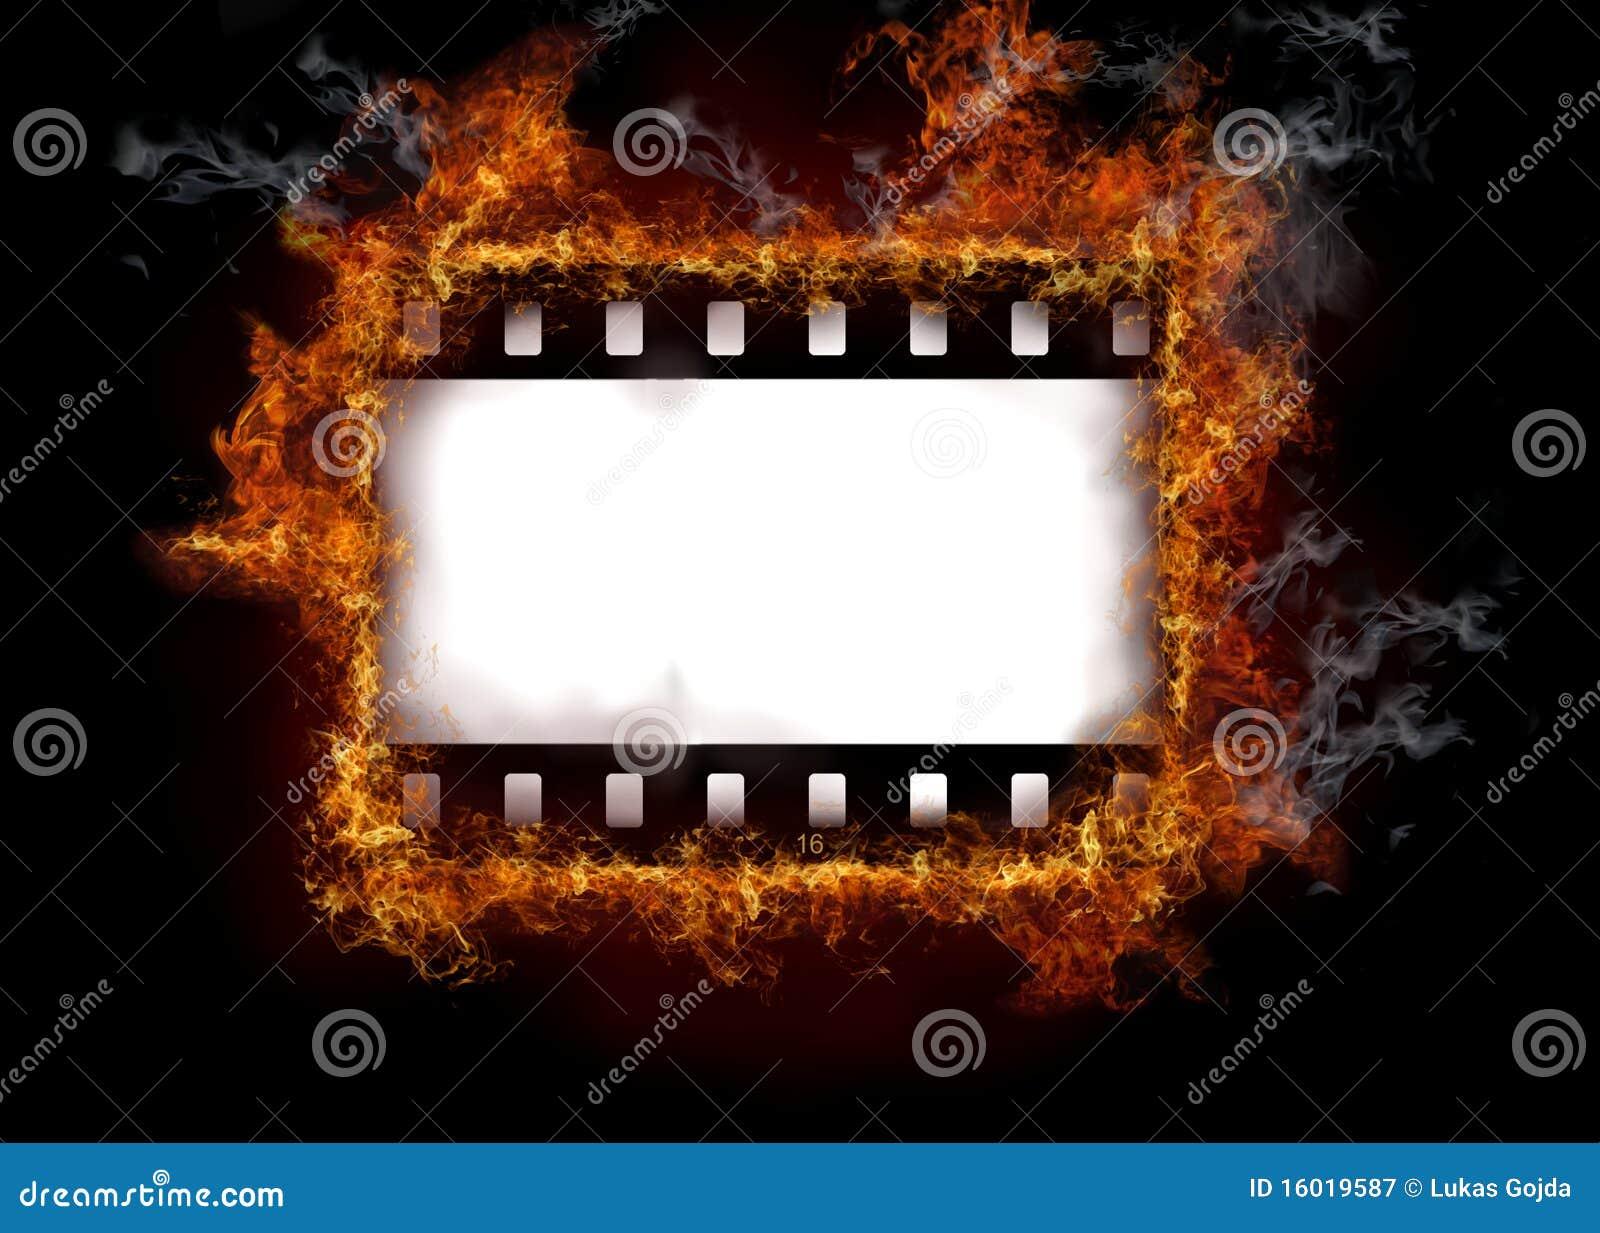 Burning film strip stock illustration  Illustration of